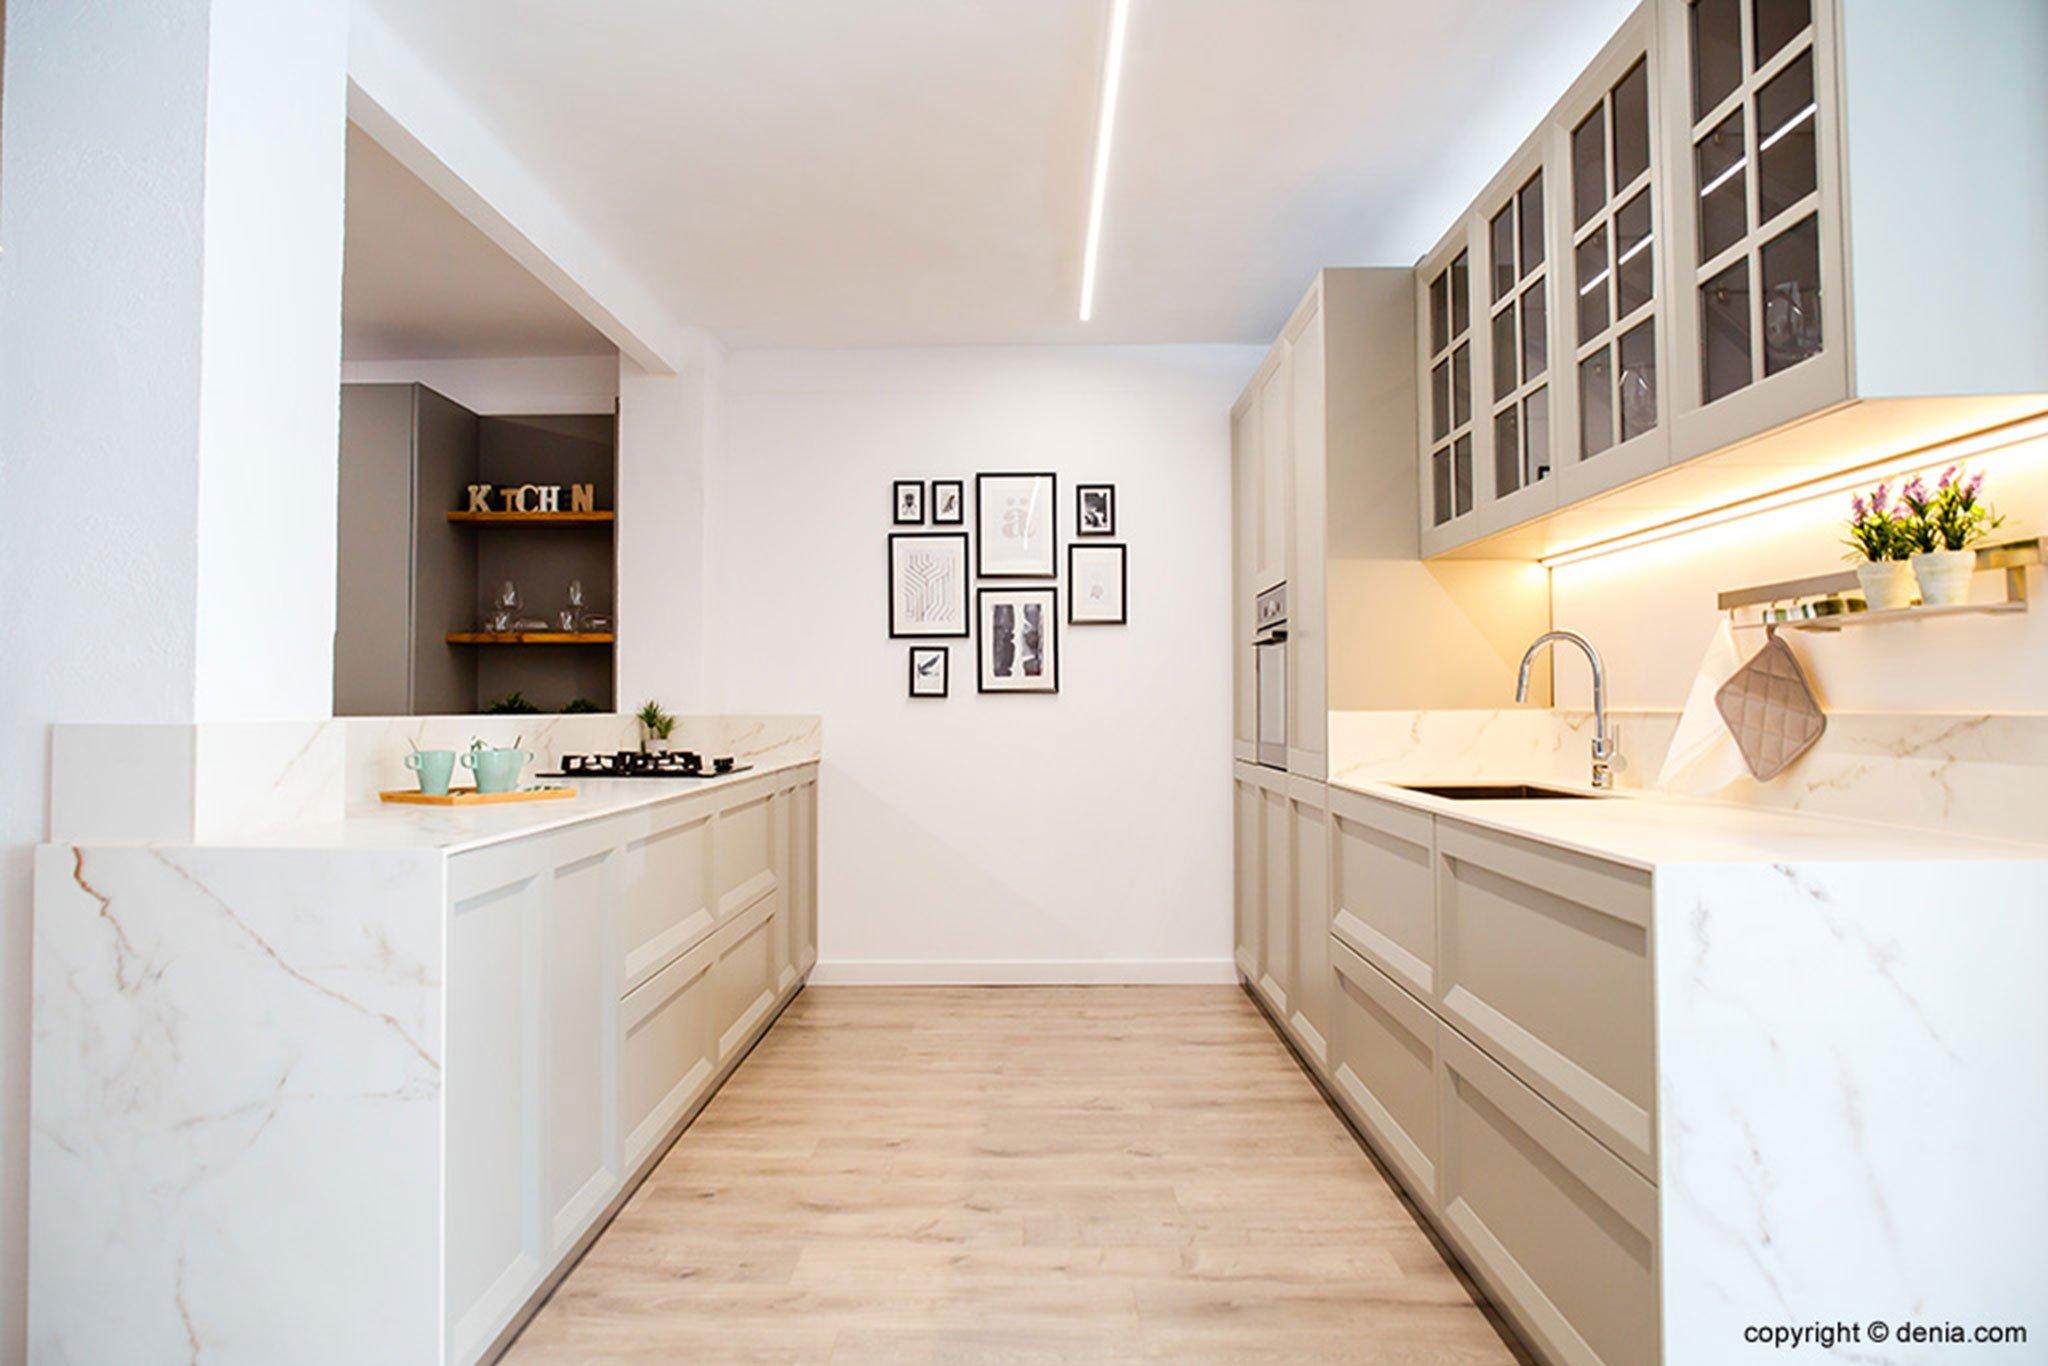 Cocina con detalles decorativos – Cocina Fácil